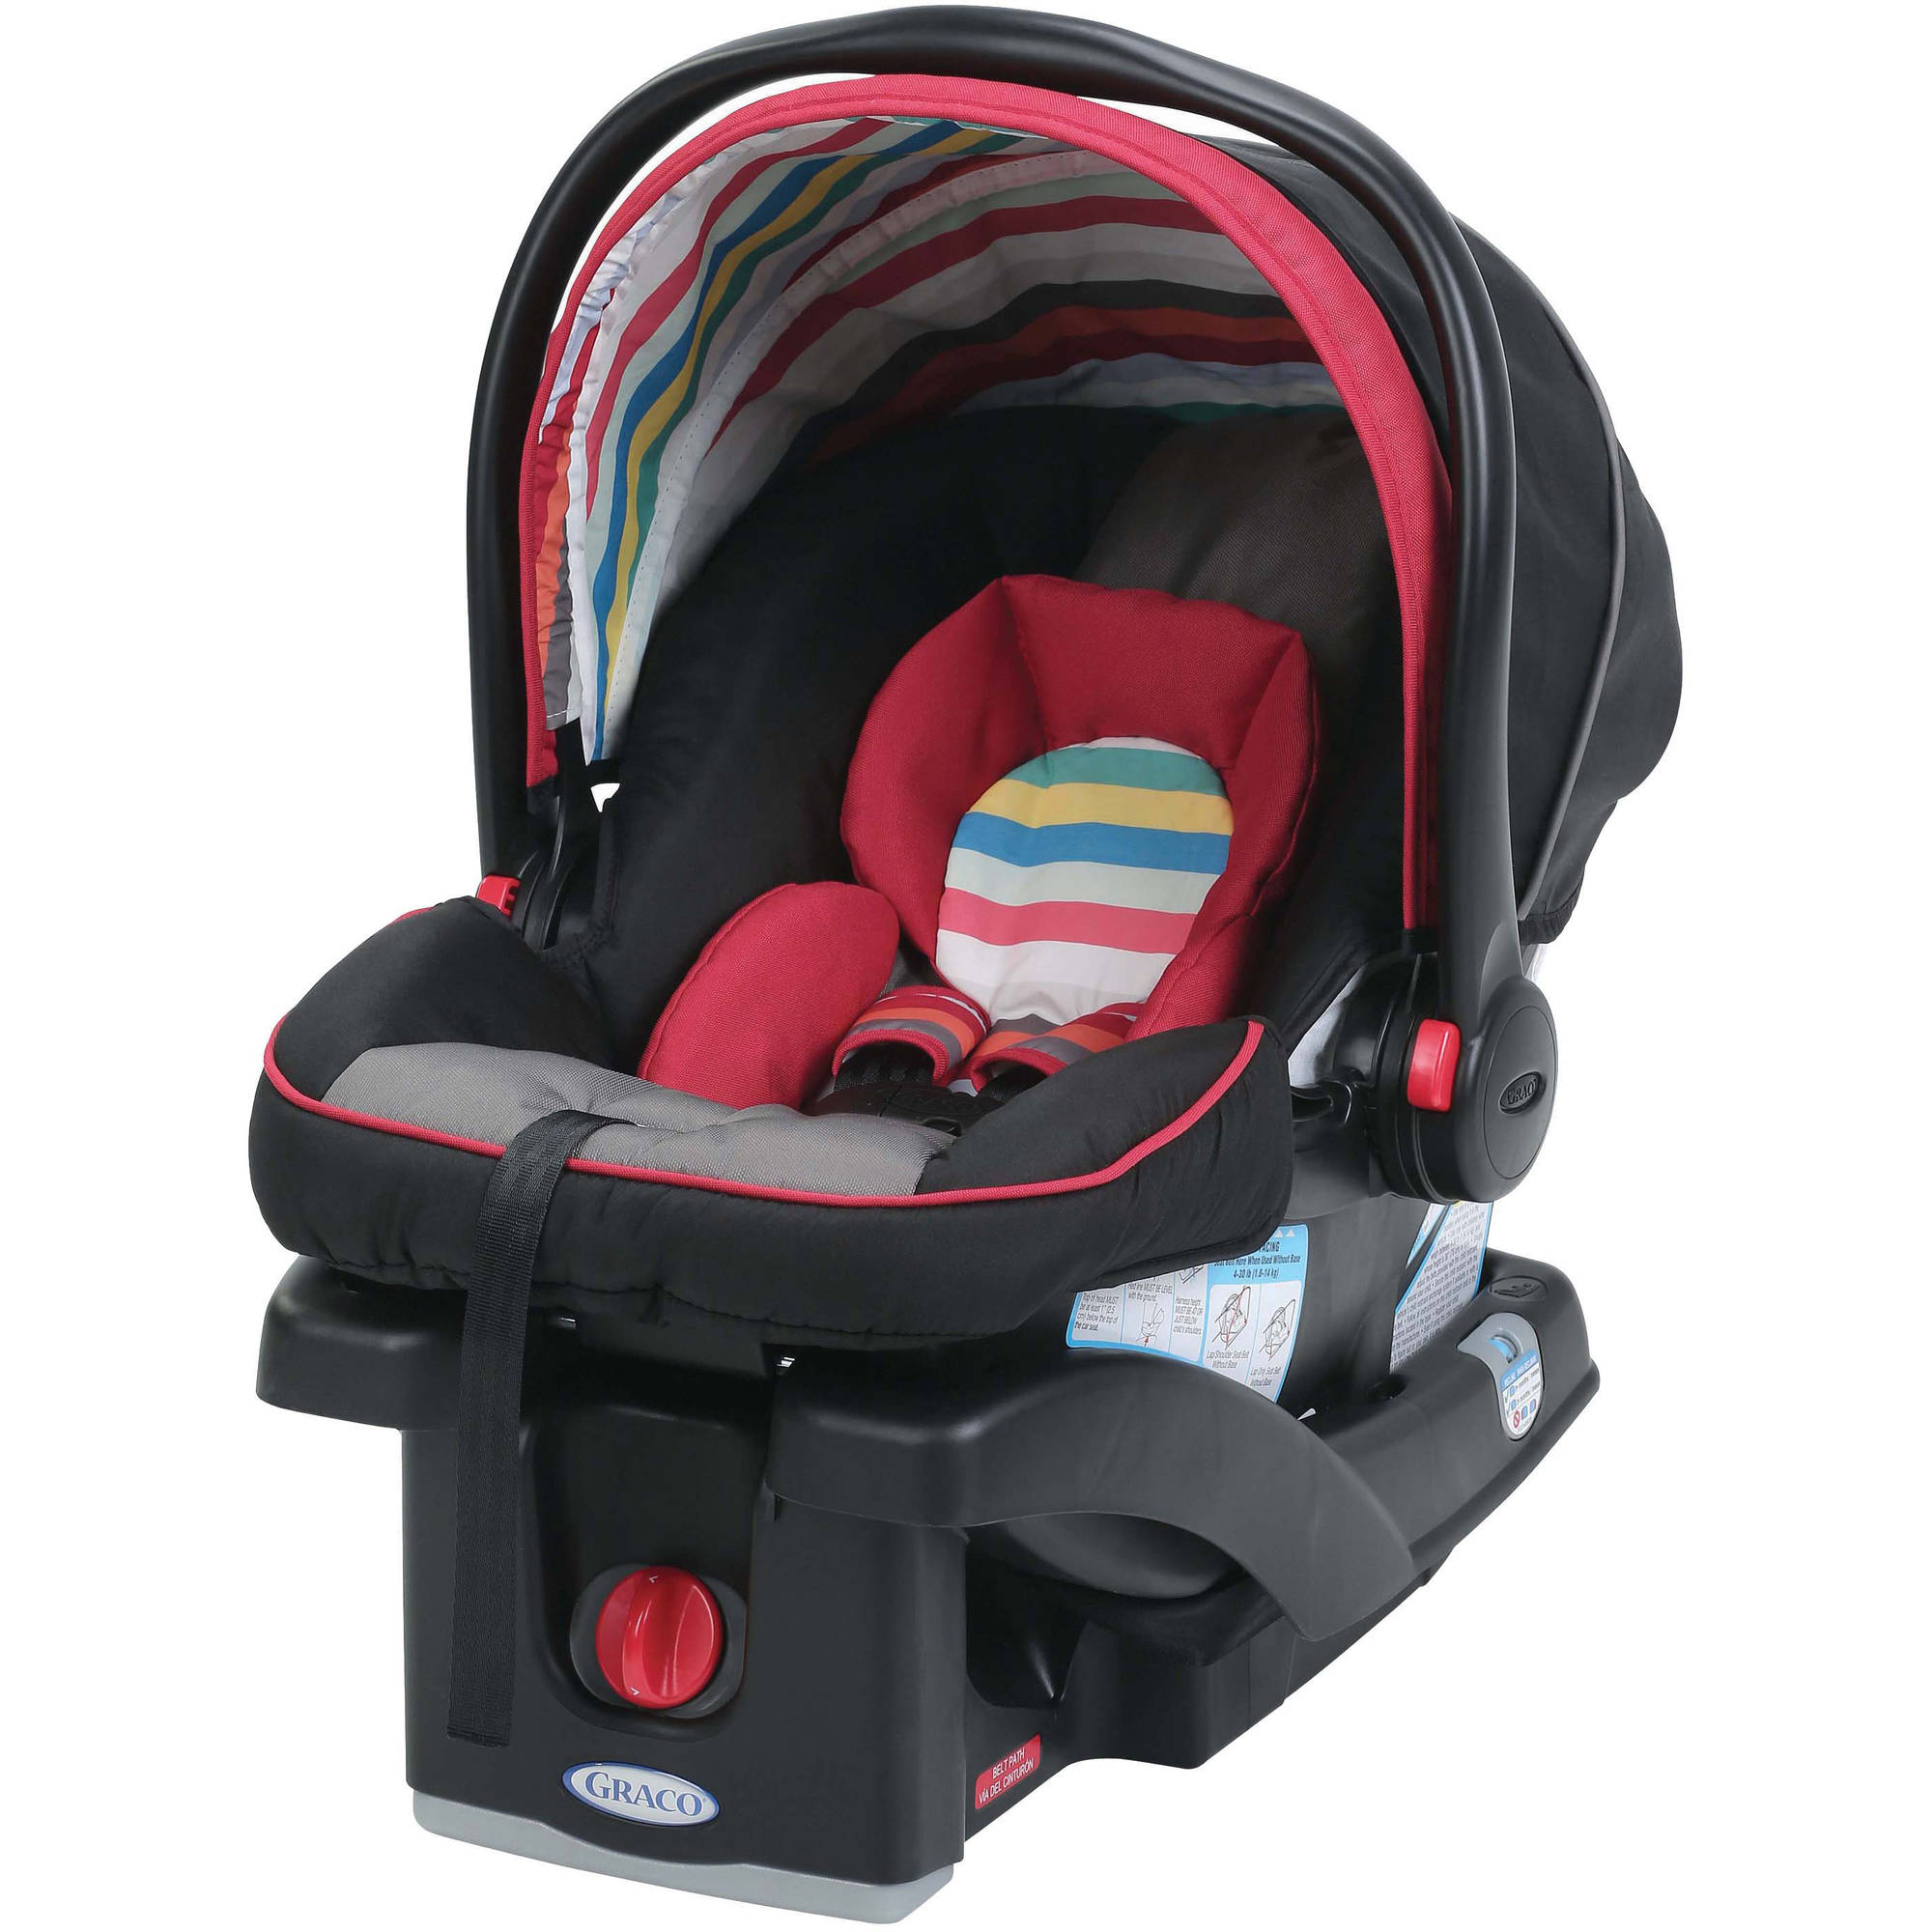 graco snugride 30 lx click connect infant car seat with front adjust choose ebay. Black Bedroom Furniture Sets. Home Design Ideas